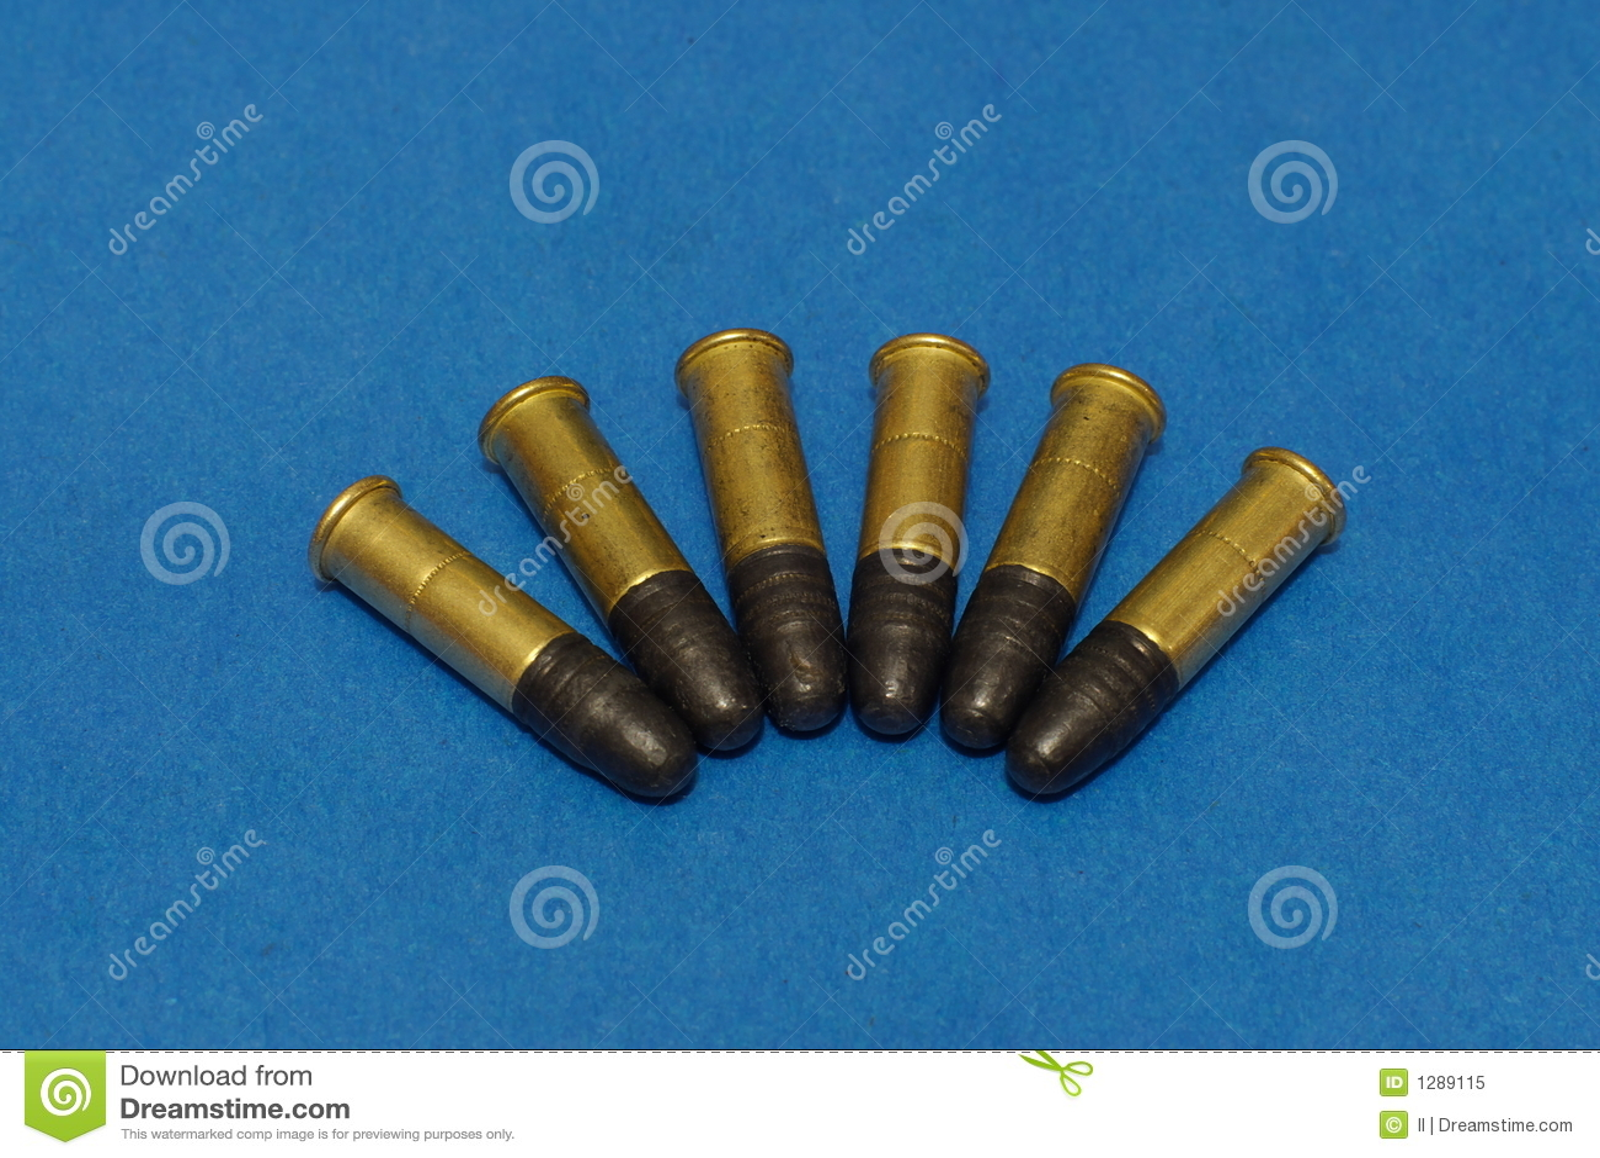 22lr ammunition stock image image of blue shooting 1289115